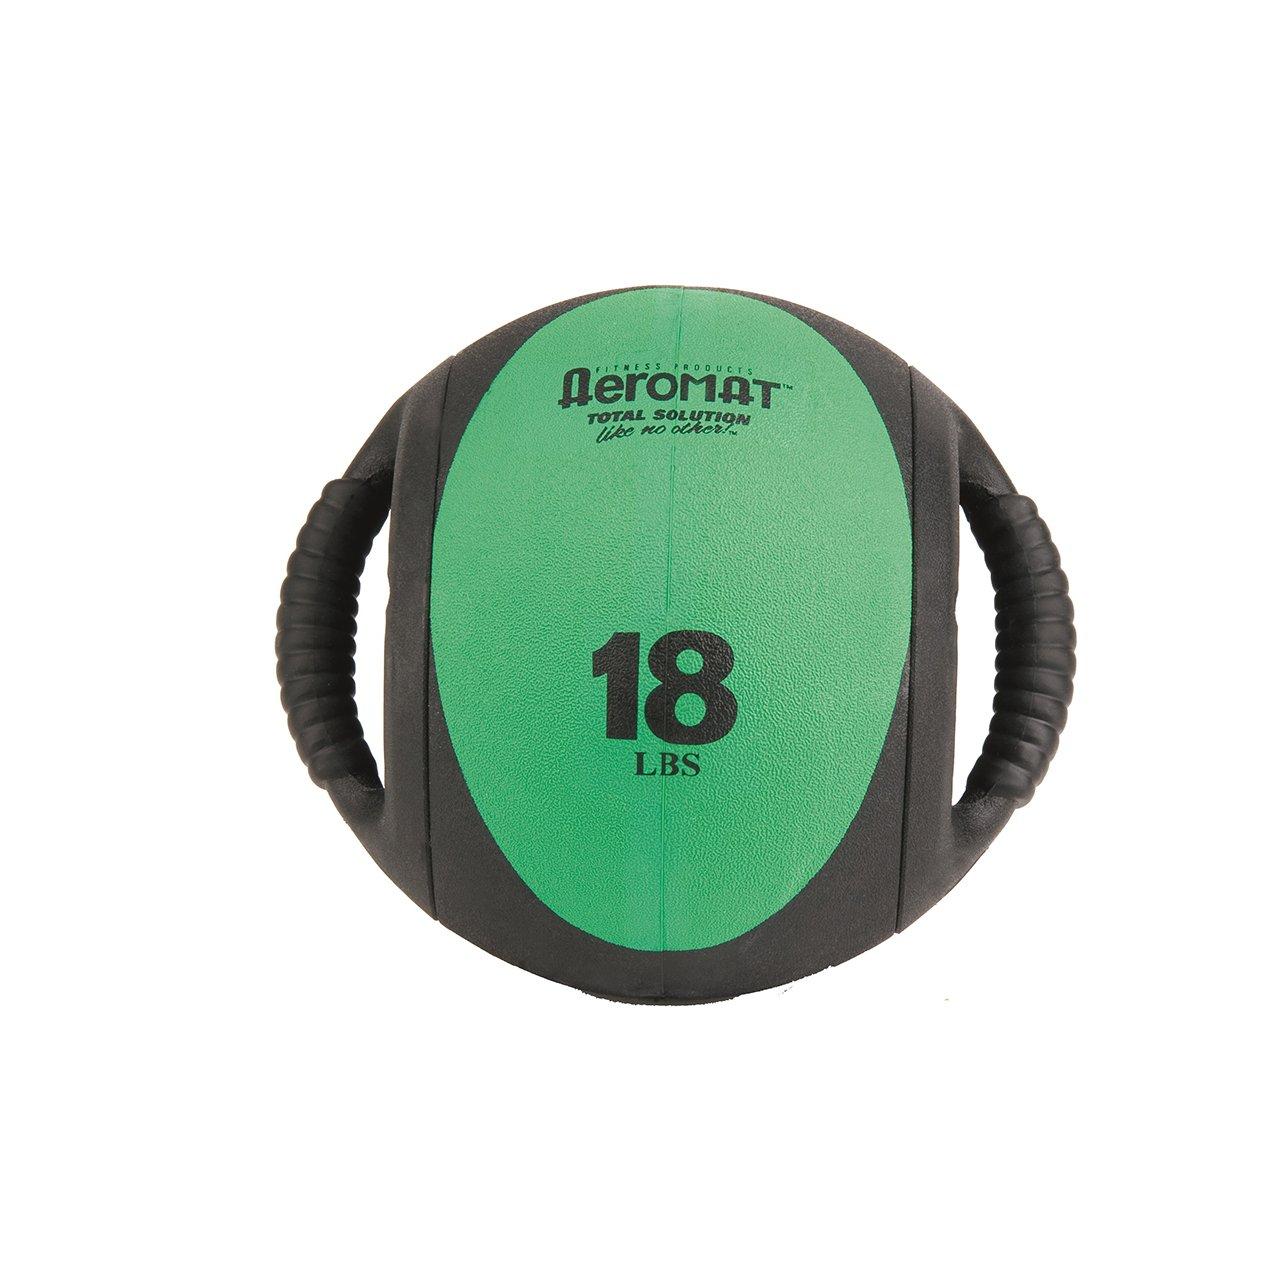 Aeromat Dual Grip Power Medicine Ball, 9cm/18-Pound, Black/Green